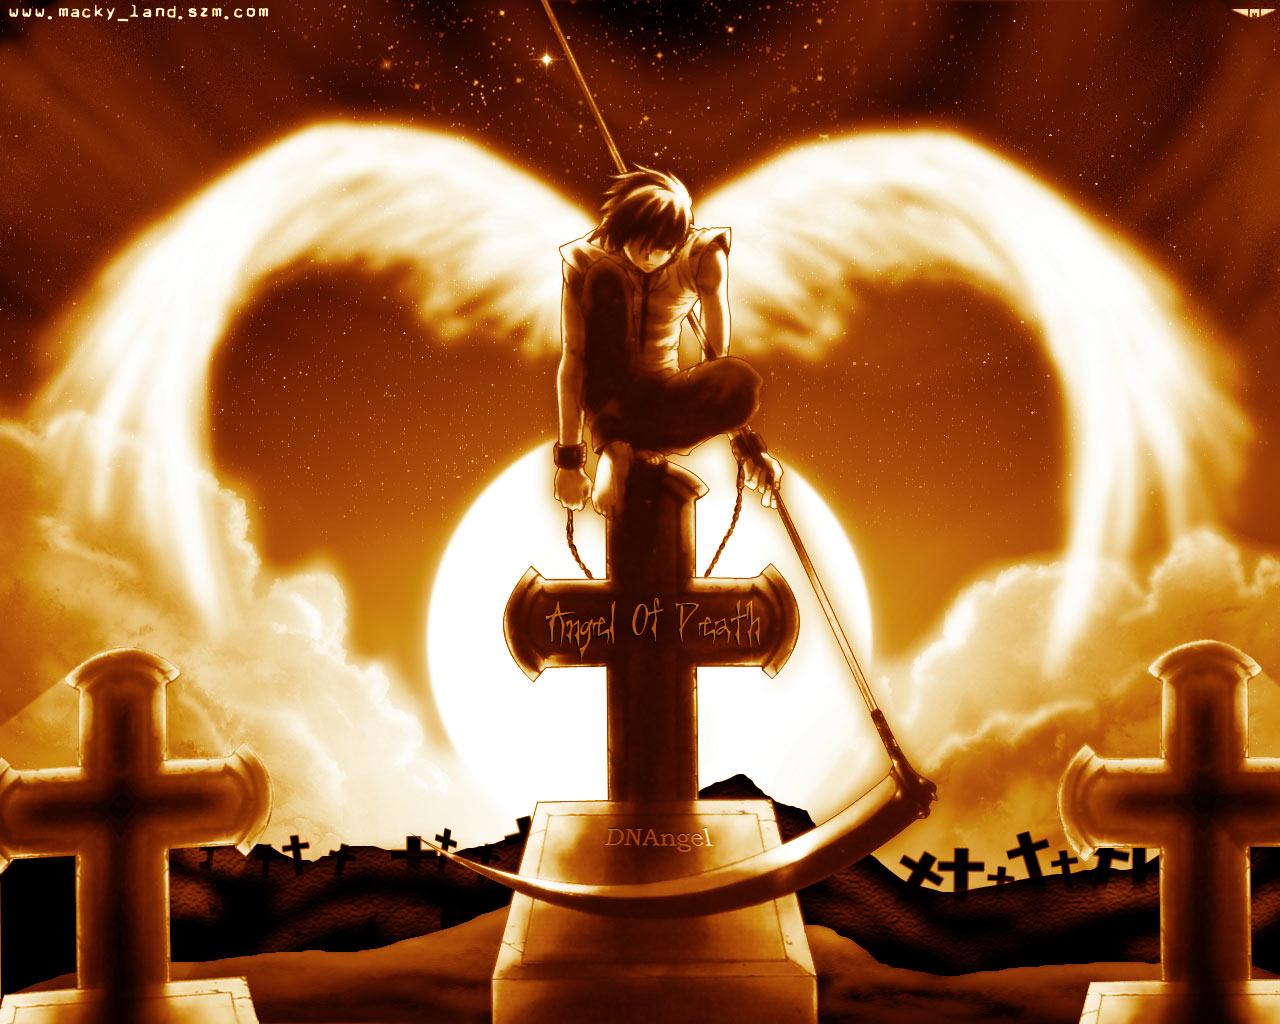 Death Angels Dark Anime Angels Wallpaper 28213390 Fanpop